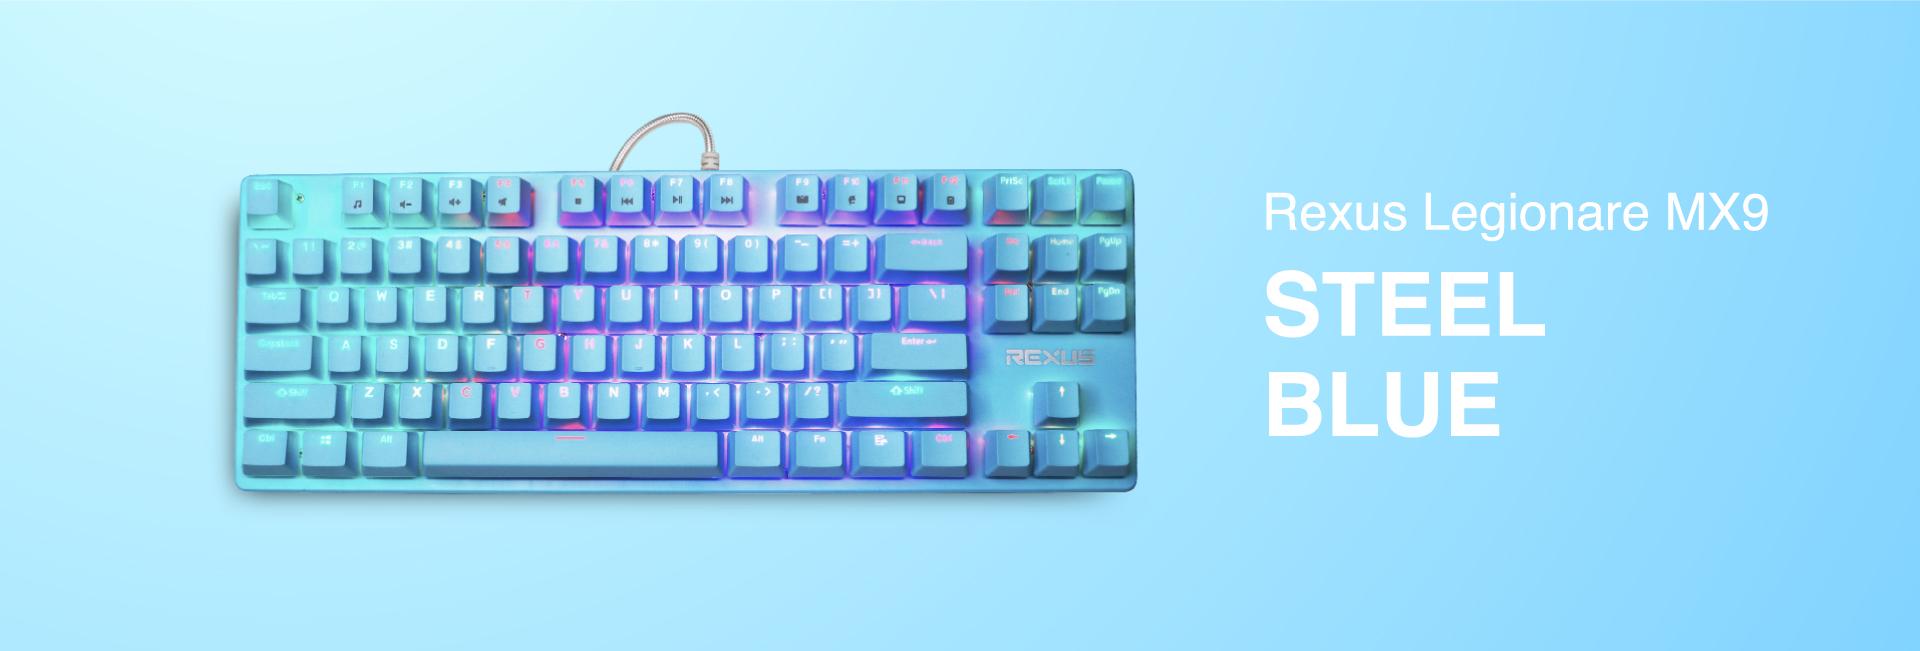 keyboard gaming Rexus Legionare MX9 WL MX9 04